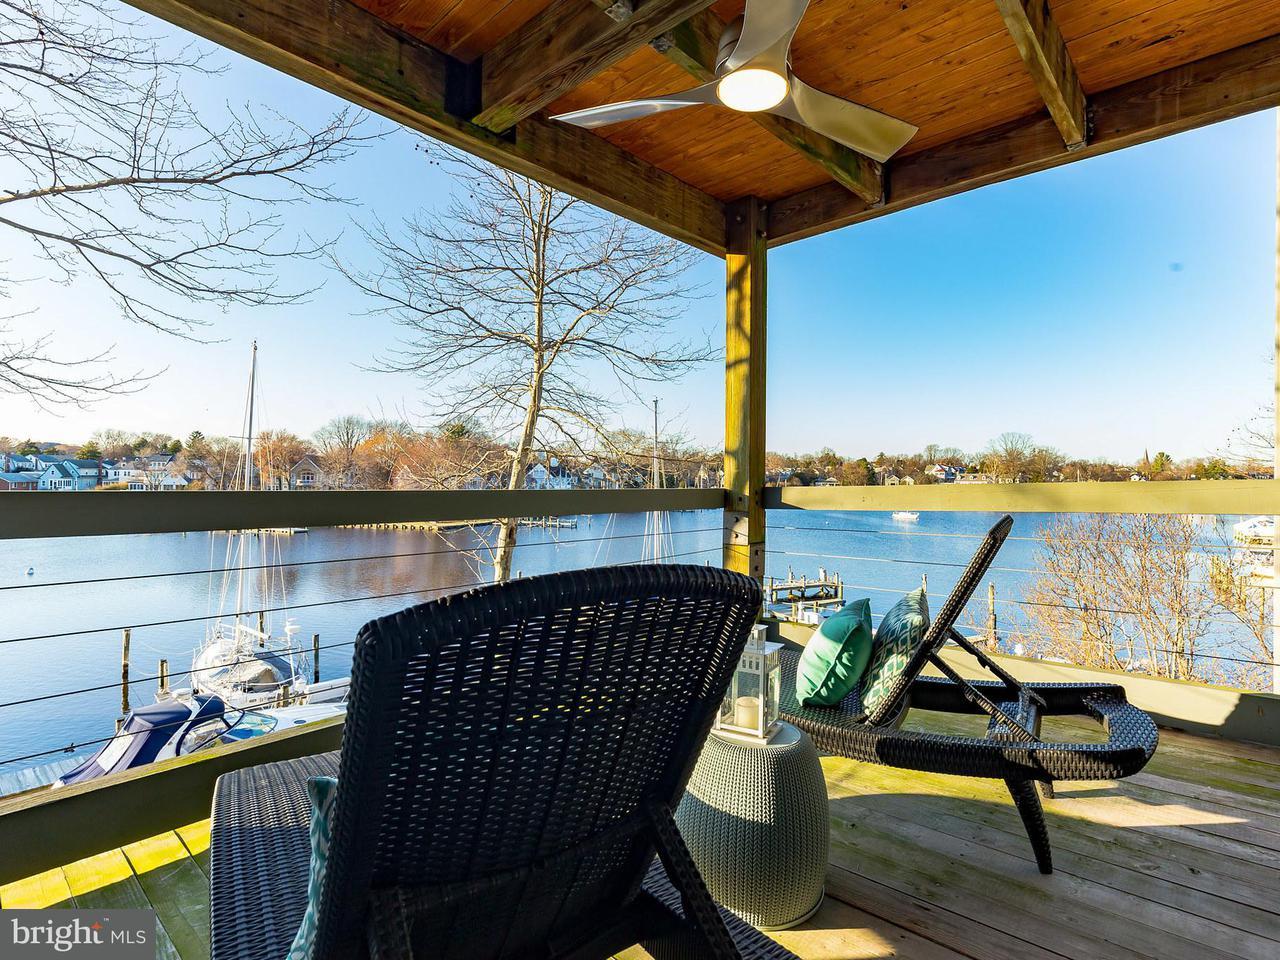 Condominium for Sale at 16 Spa Creek Lndg #A3 16 Spa Creek Lndg #A3 Annapolis, Maryland 21403 United States